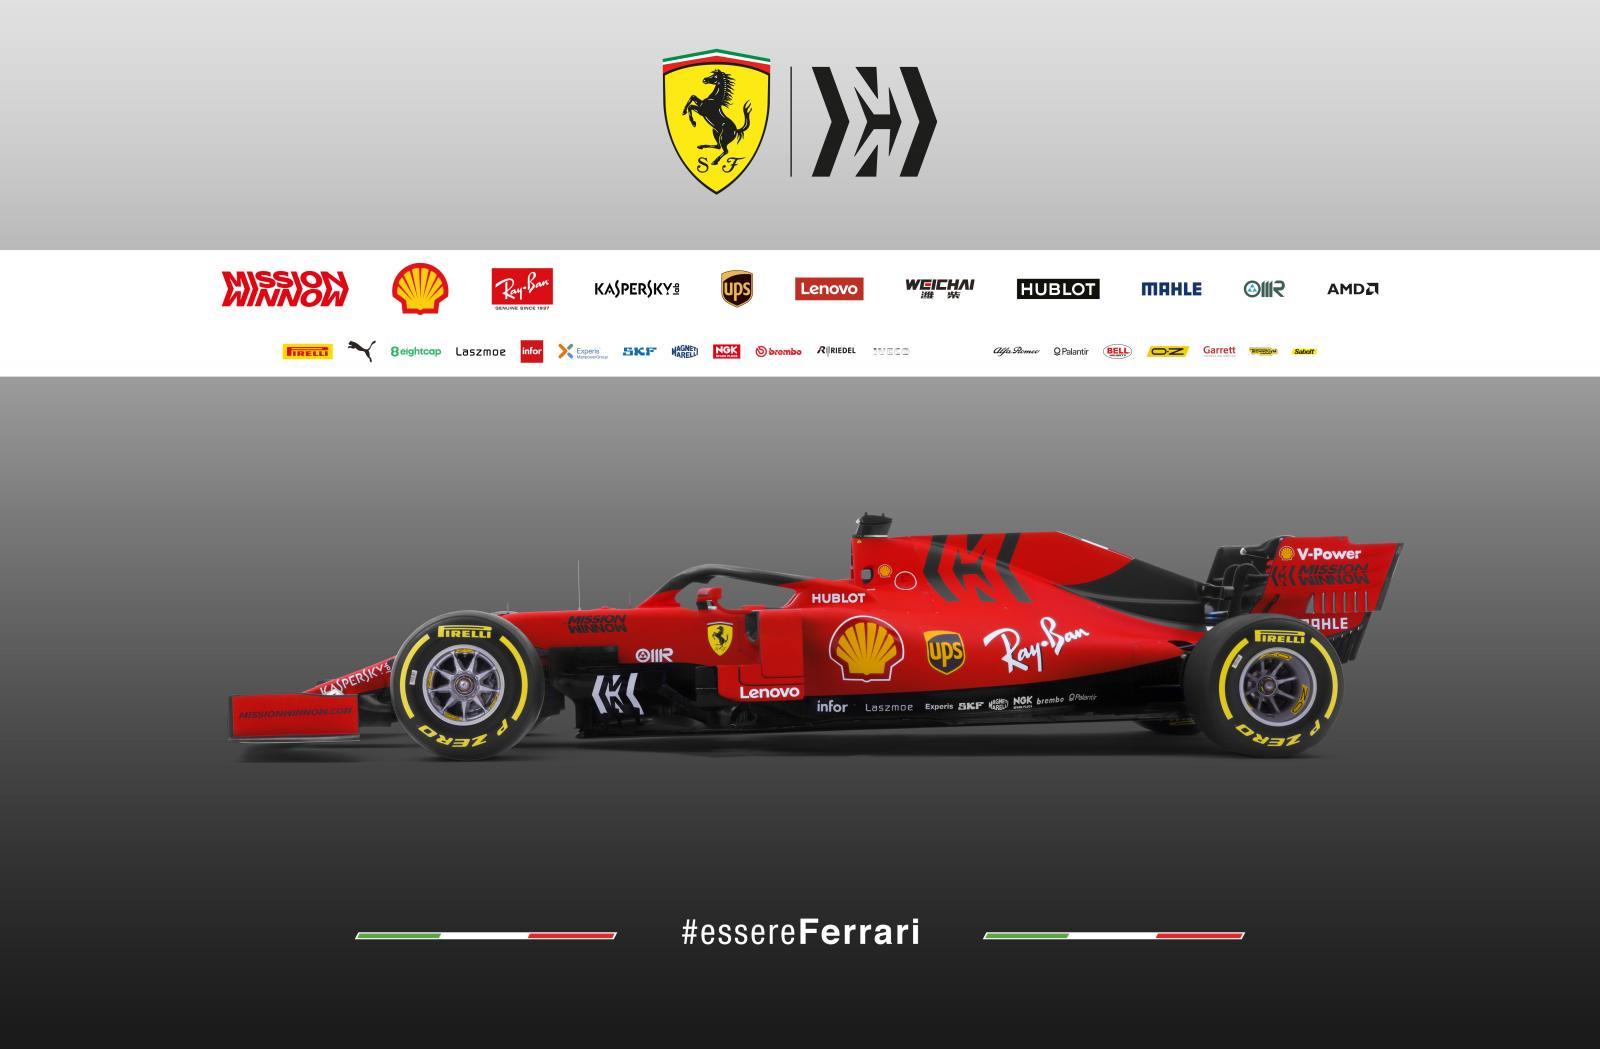 2019-ferrari-f1-car